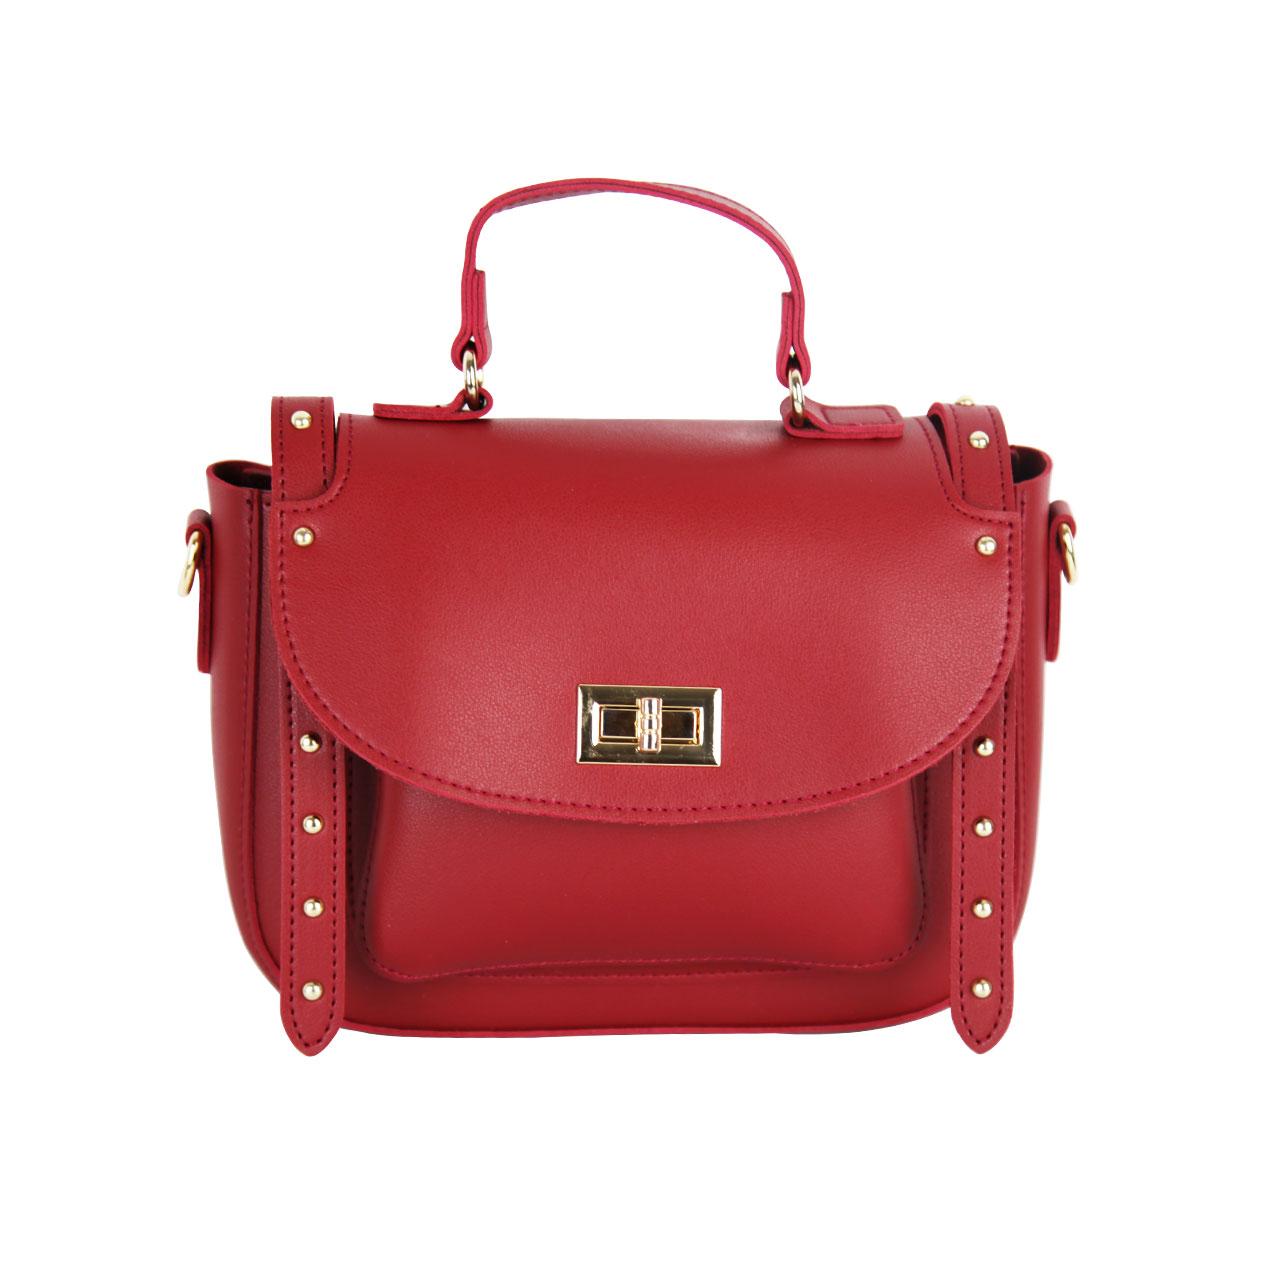 Oxford Red/Pink/White/Golden Metropolitan Leather Bag